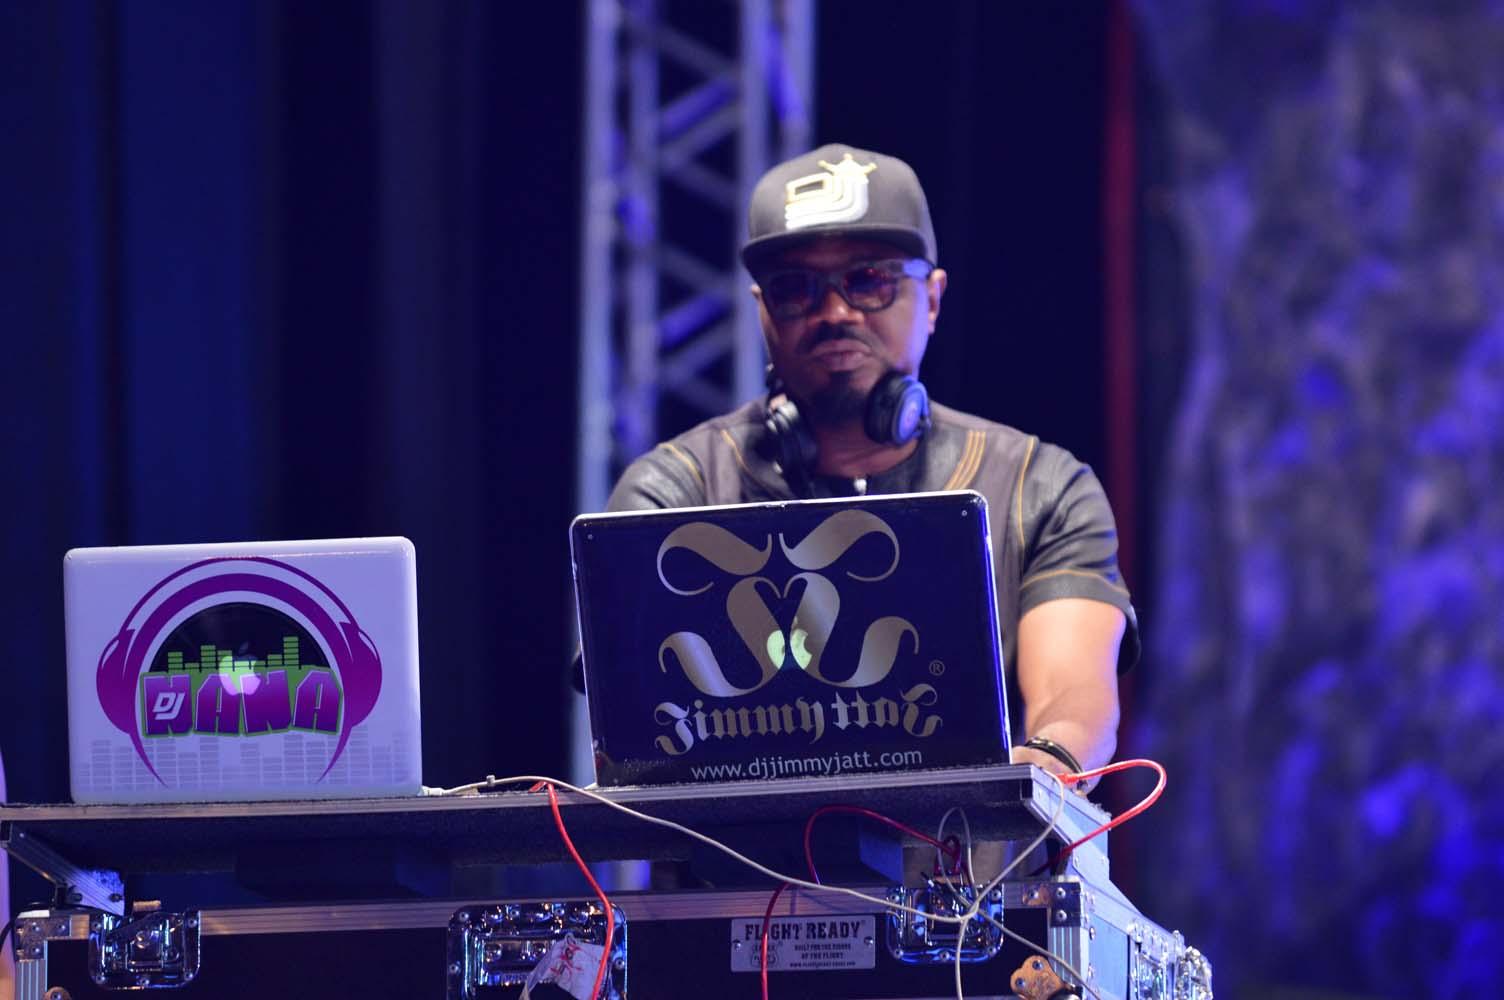 DJ Jimmy Jatt